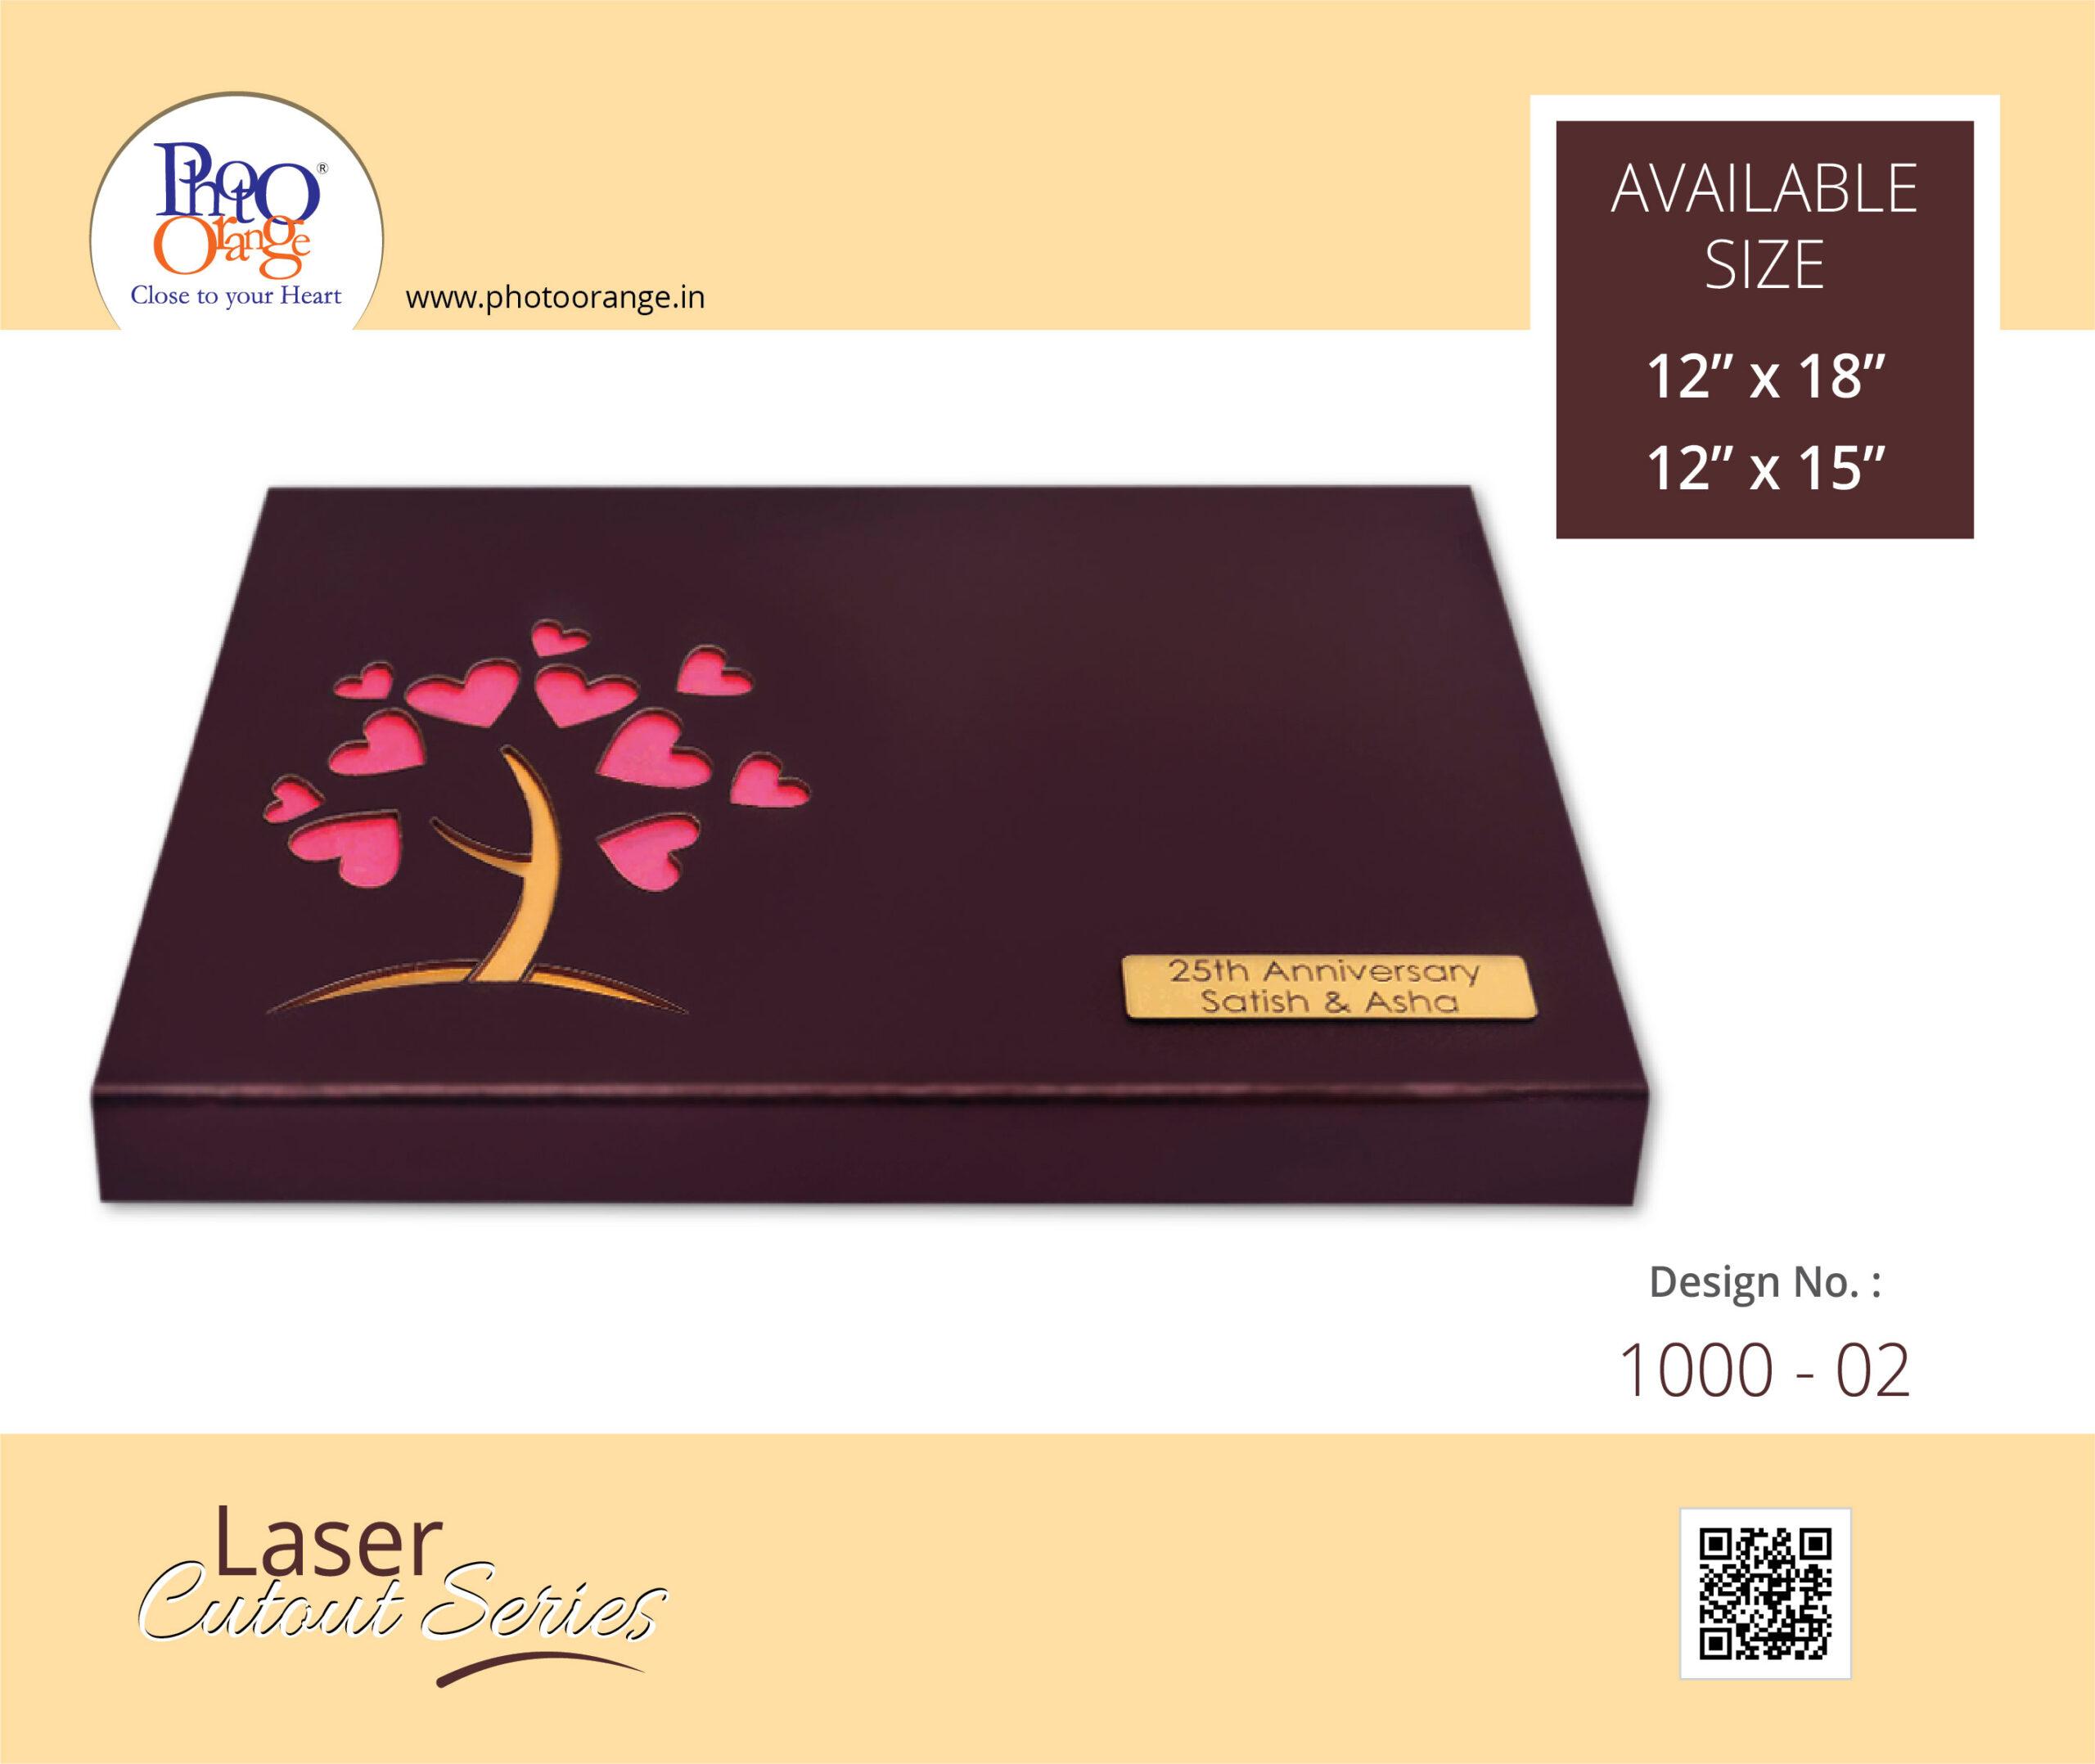 Laser Cutout Series 1000 02